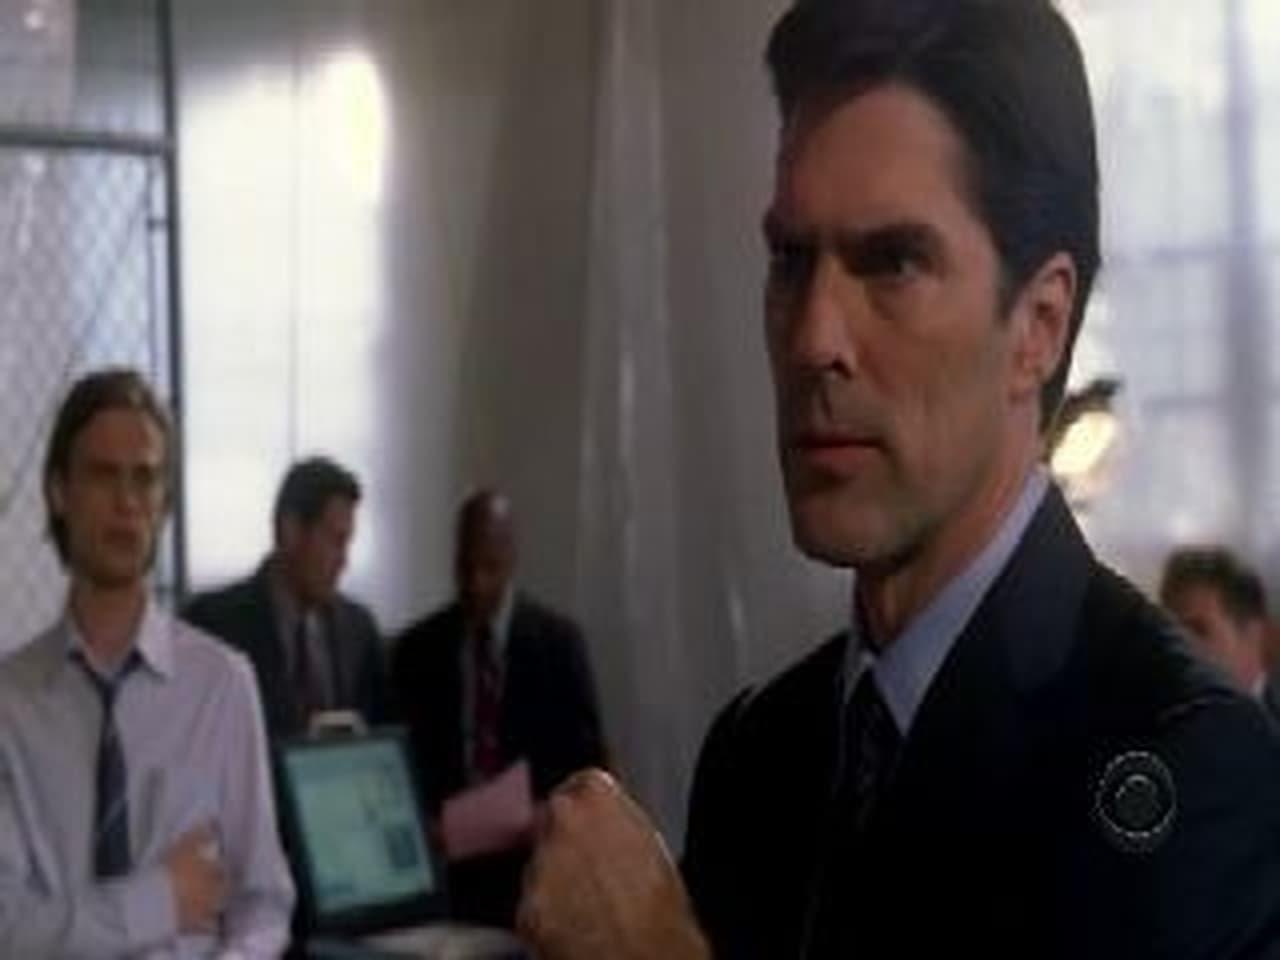 Criminal Minds - Season 1 Episode 20 : Charm and Harm